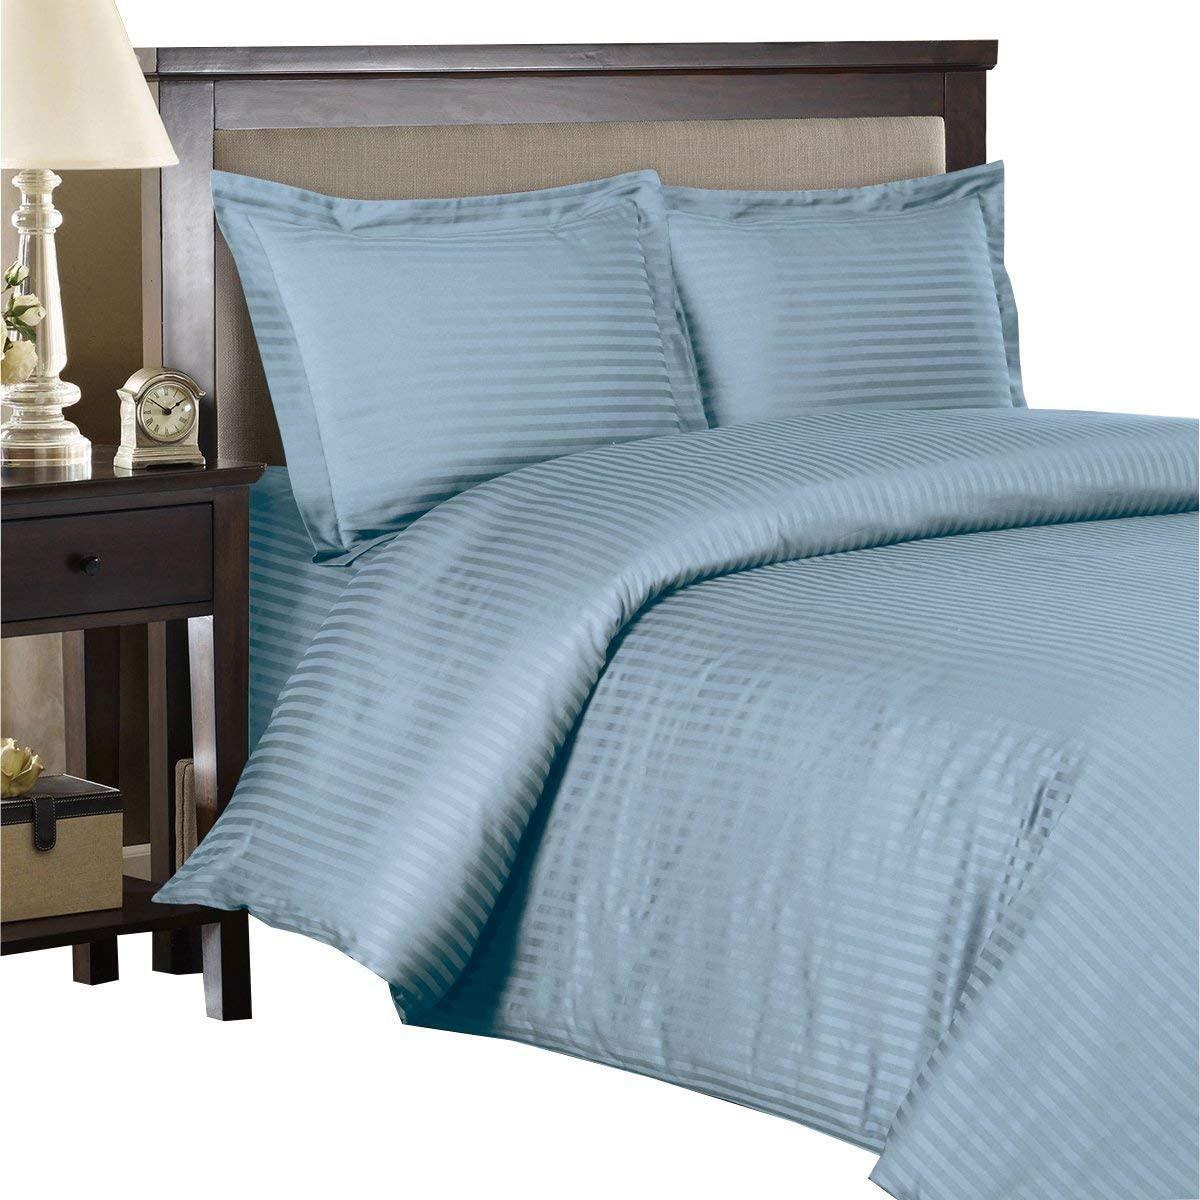 Royal Hotel Ultra Soft Duvet Cover Set, 3PC Duvet Set, Wrinkle-Free, Button Closer, Striped Sateen, Duvet Covers - King/Cal-King - Blue